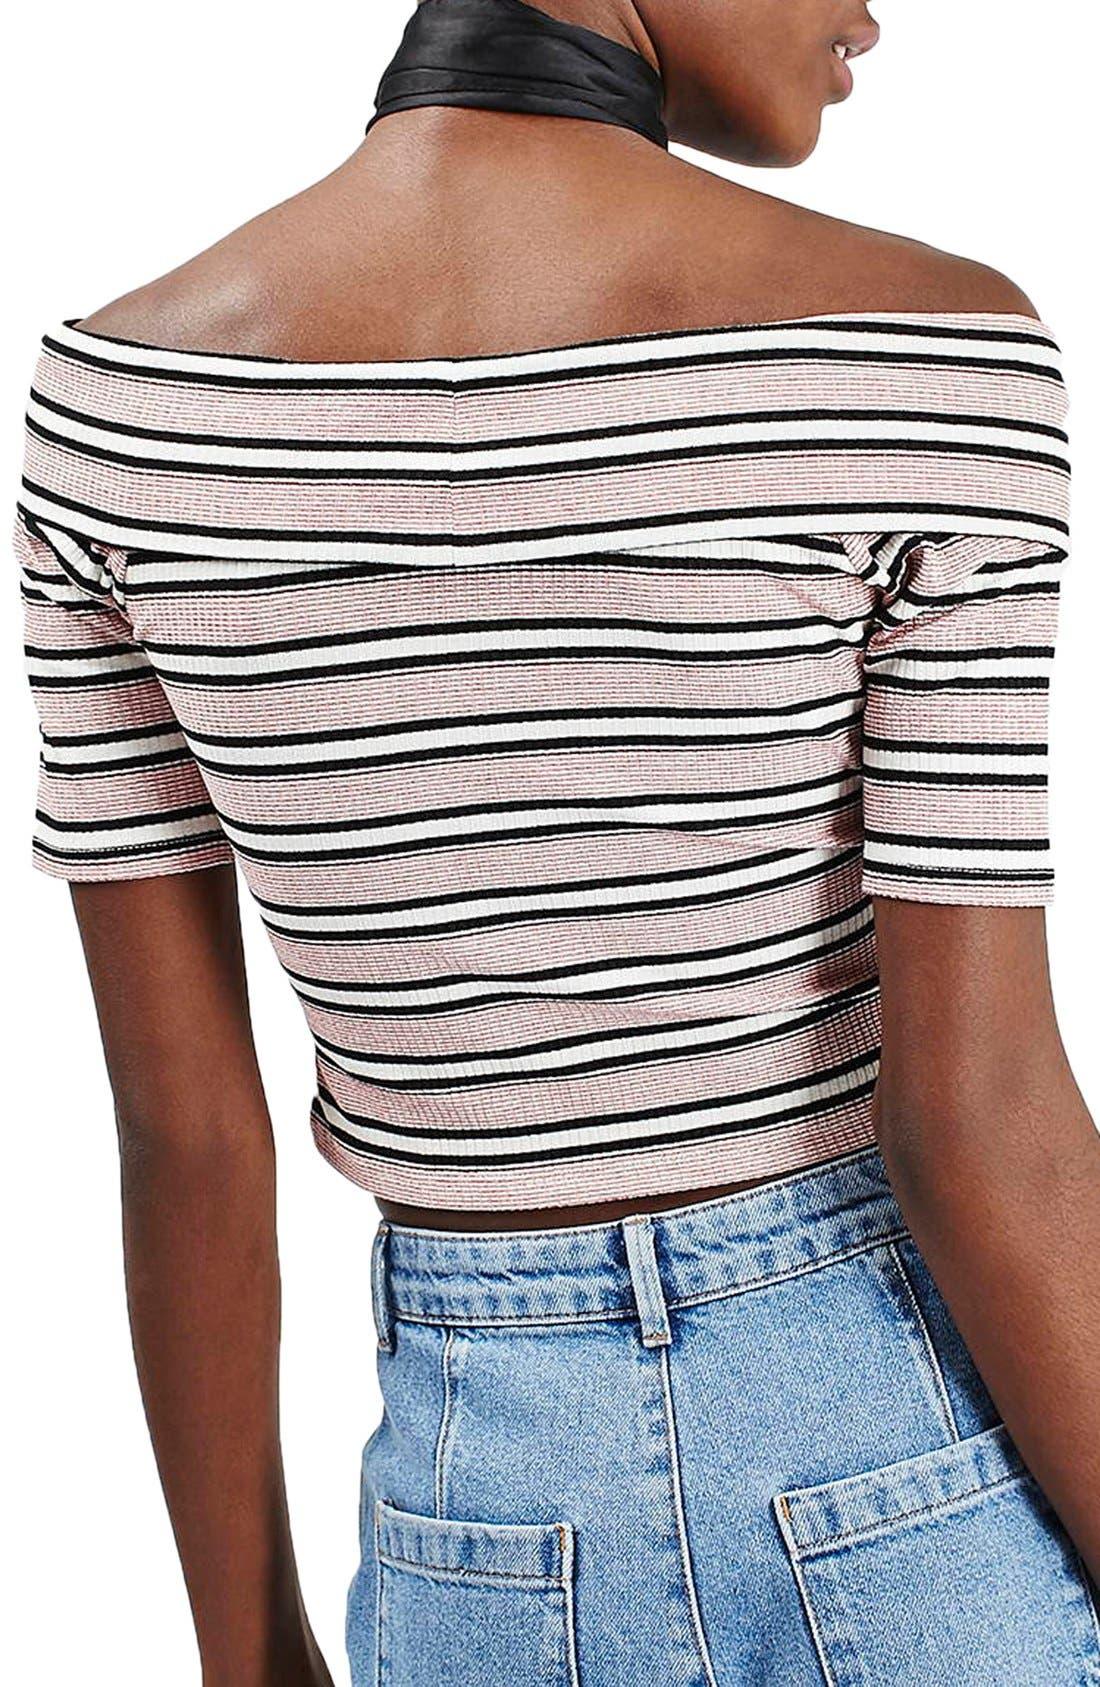 Alternate Image 3  - Topshop Stripe Off the Shoulder Crop Top (Petite)